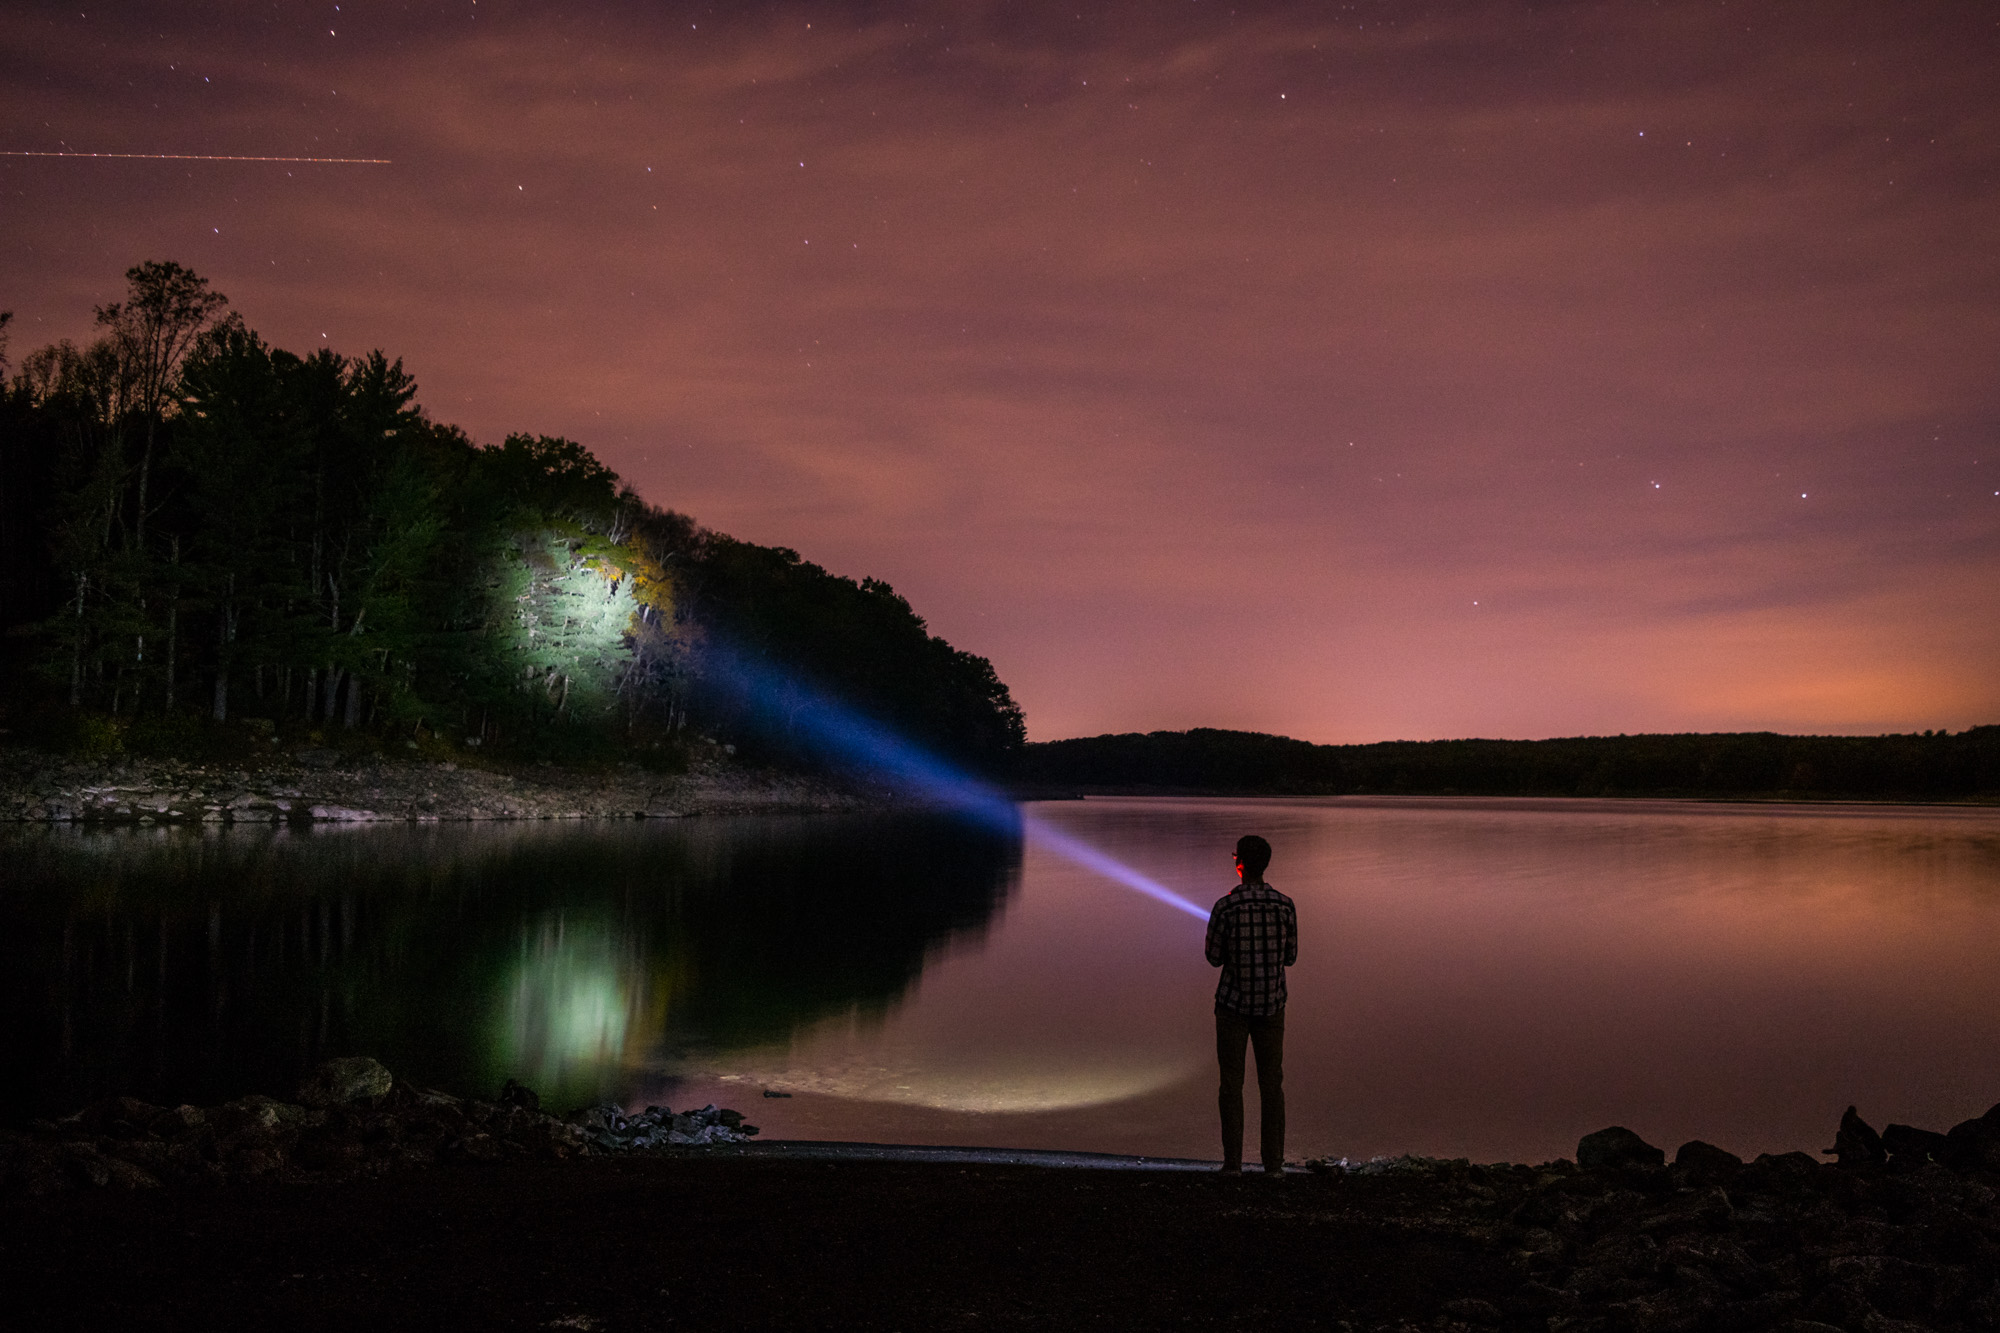 Saugatuck Reservoir in Weston, Connecticut.